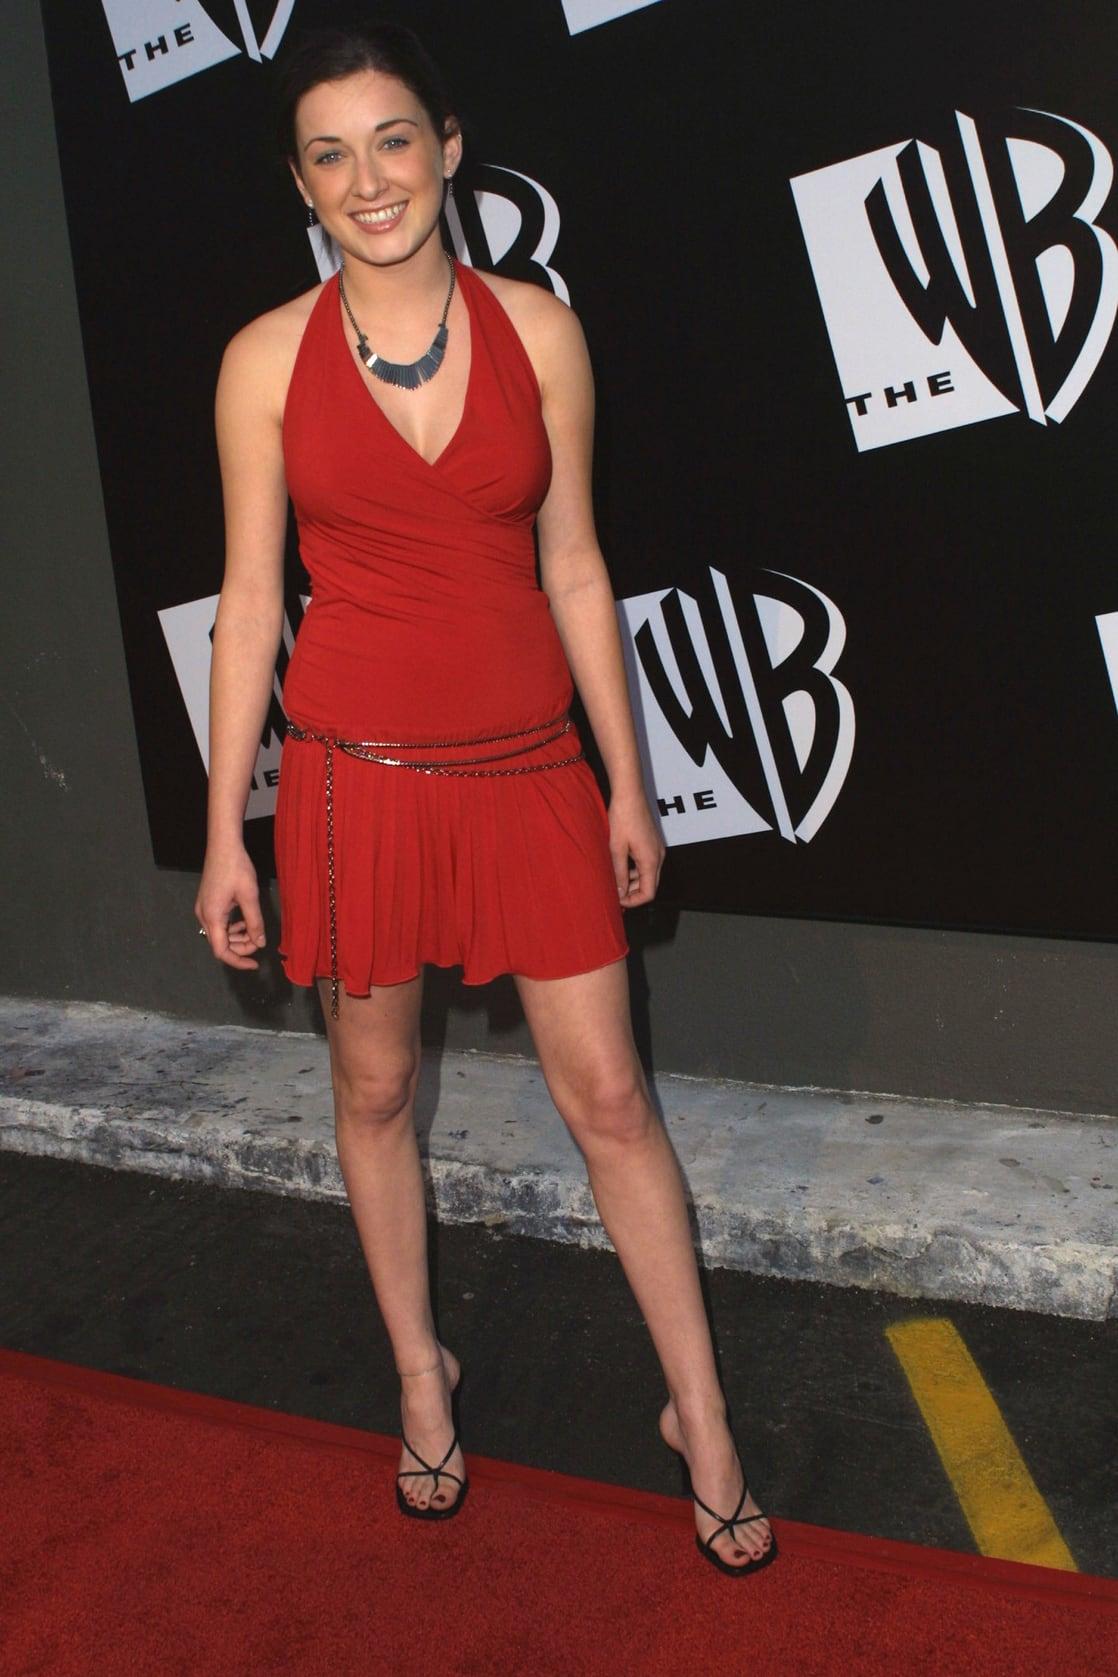 Megan Williams GBR 3 2016?resent,Alia Shawkat Erotic image Alessandra De Rossi (b. 1984),Kate Robbins